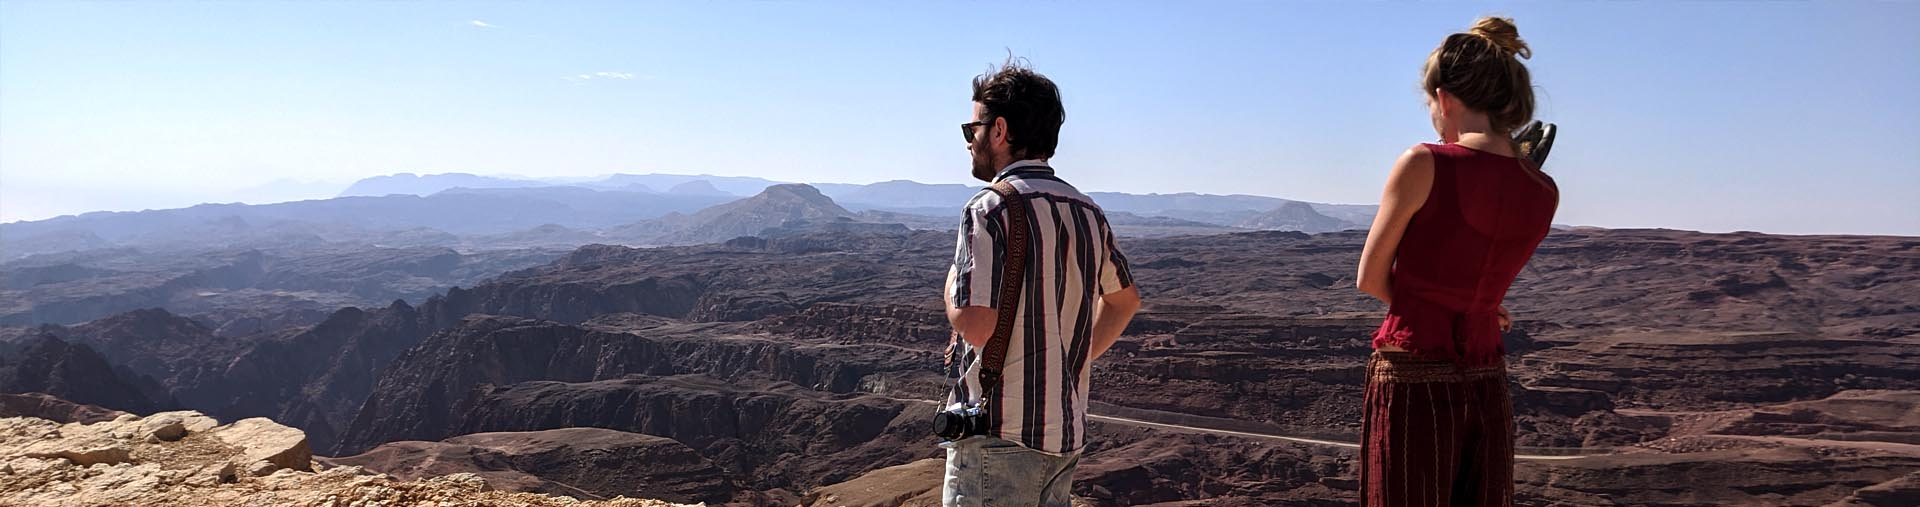 Explore Eilat mountains